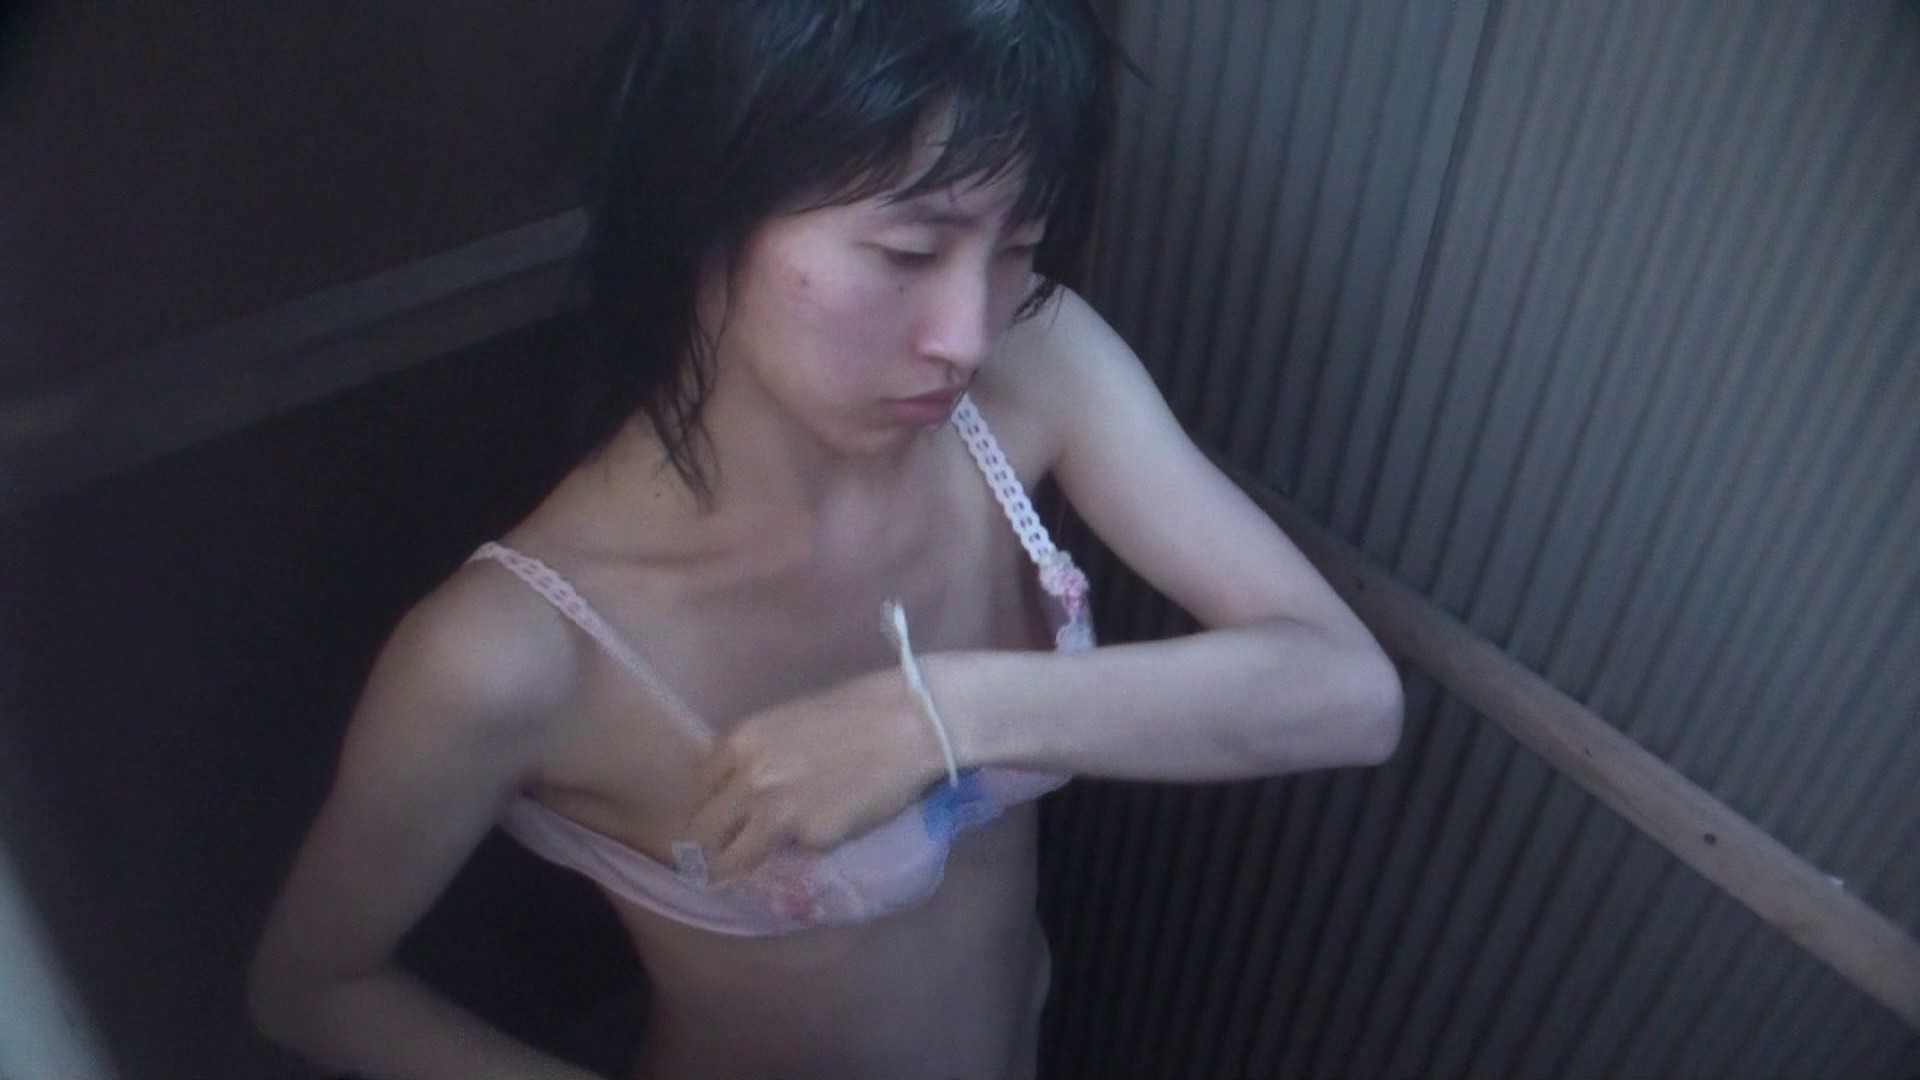 Vol.24 再登場 生理中の年齢不詳嬢 高画質 | OL  33連発 18